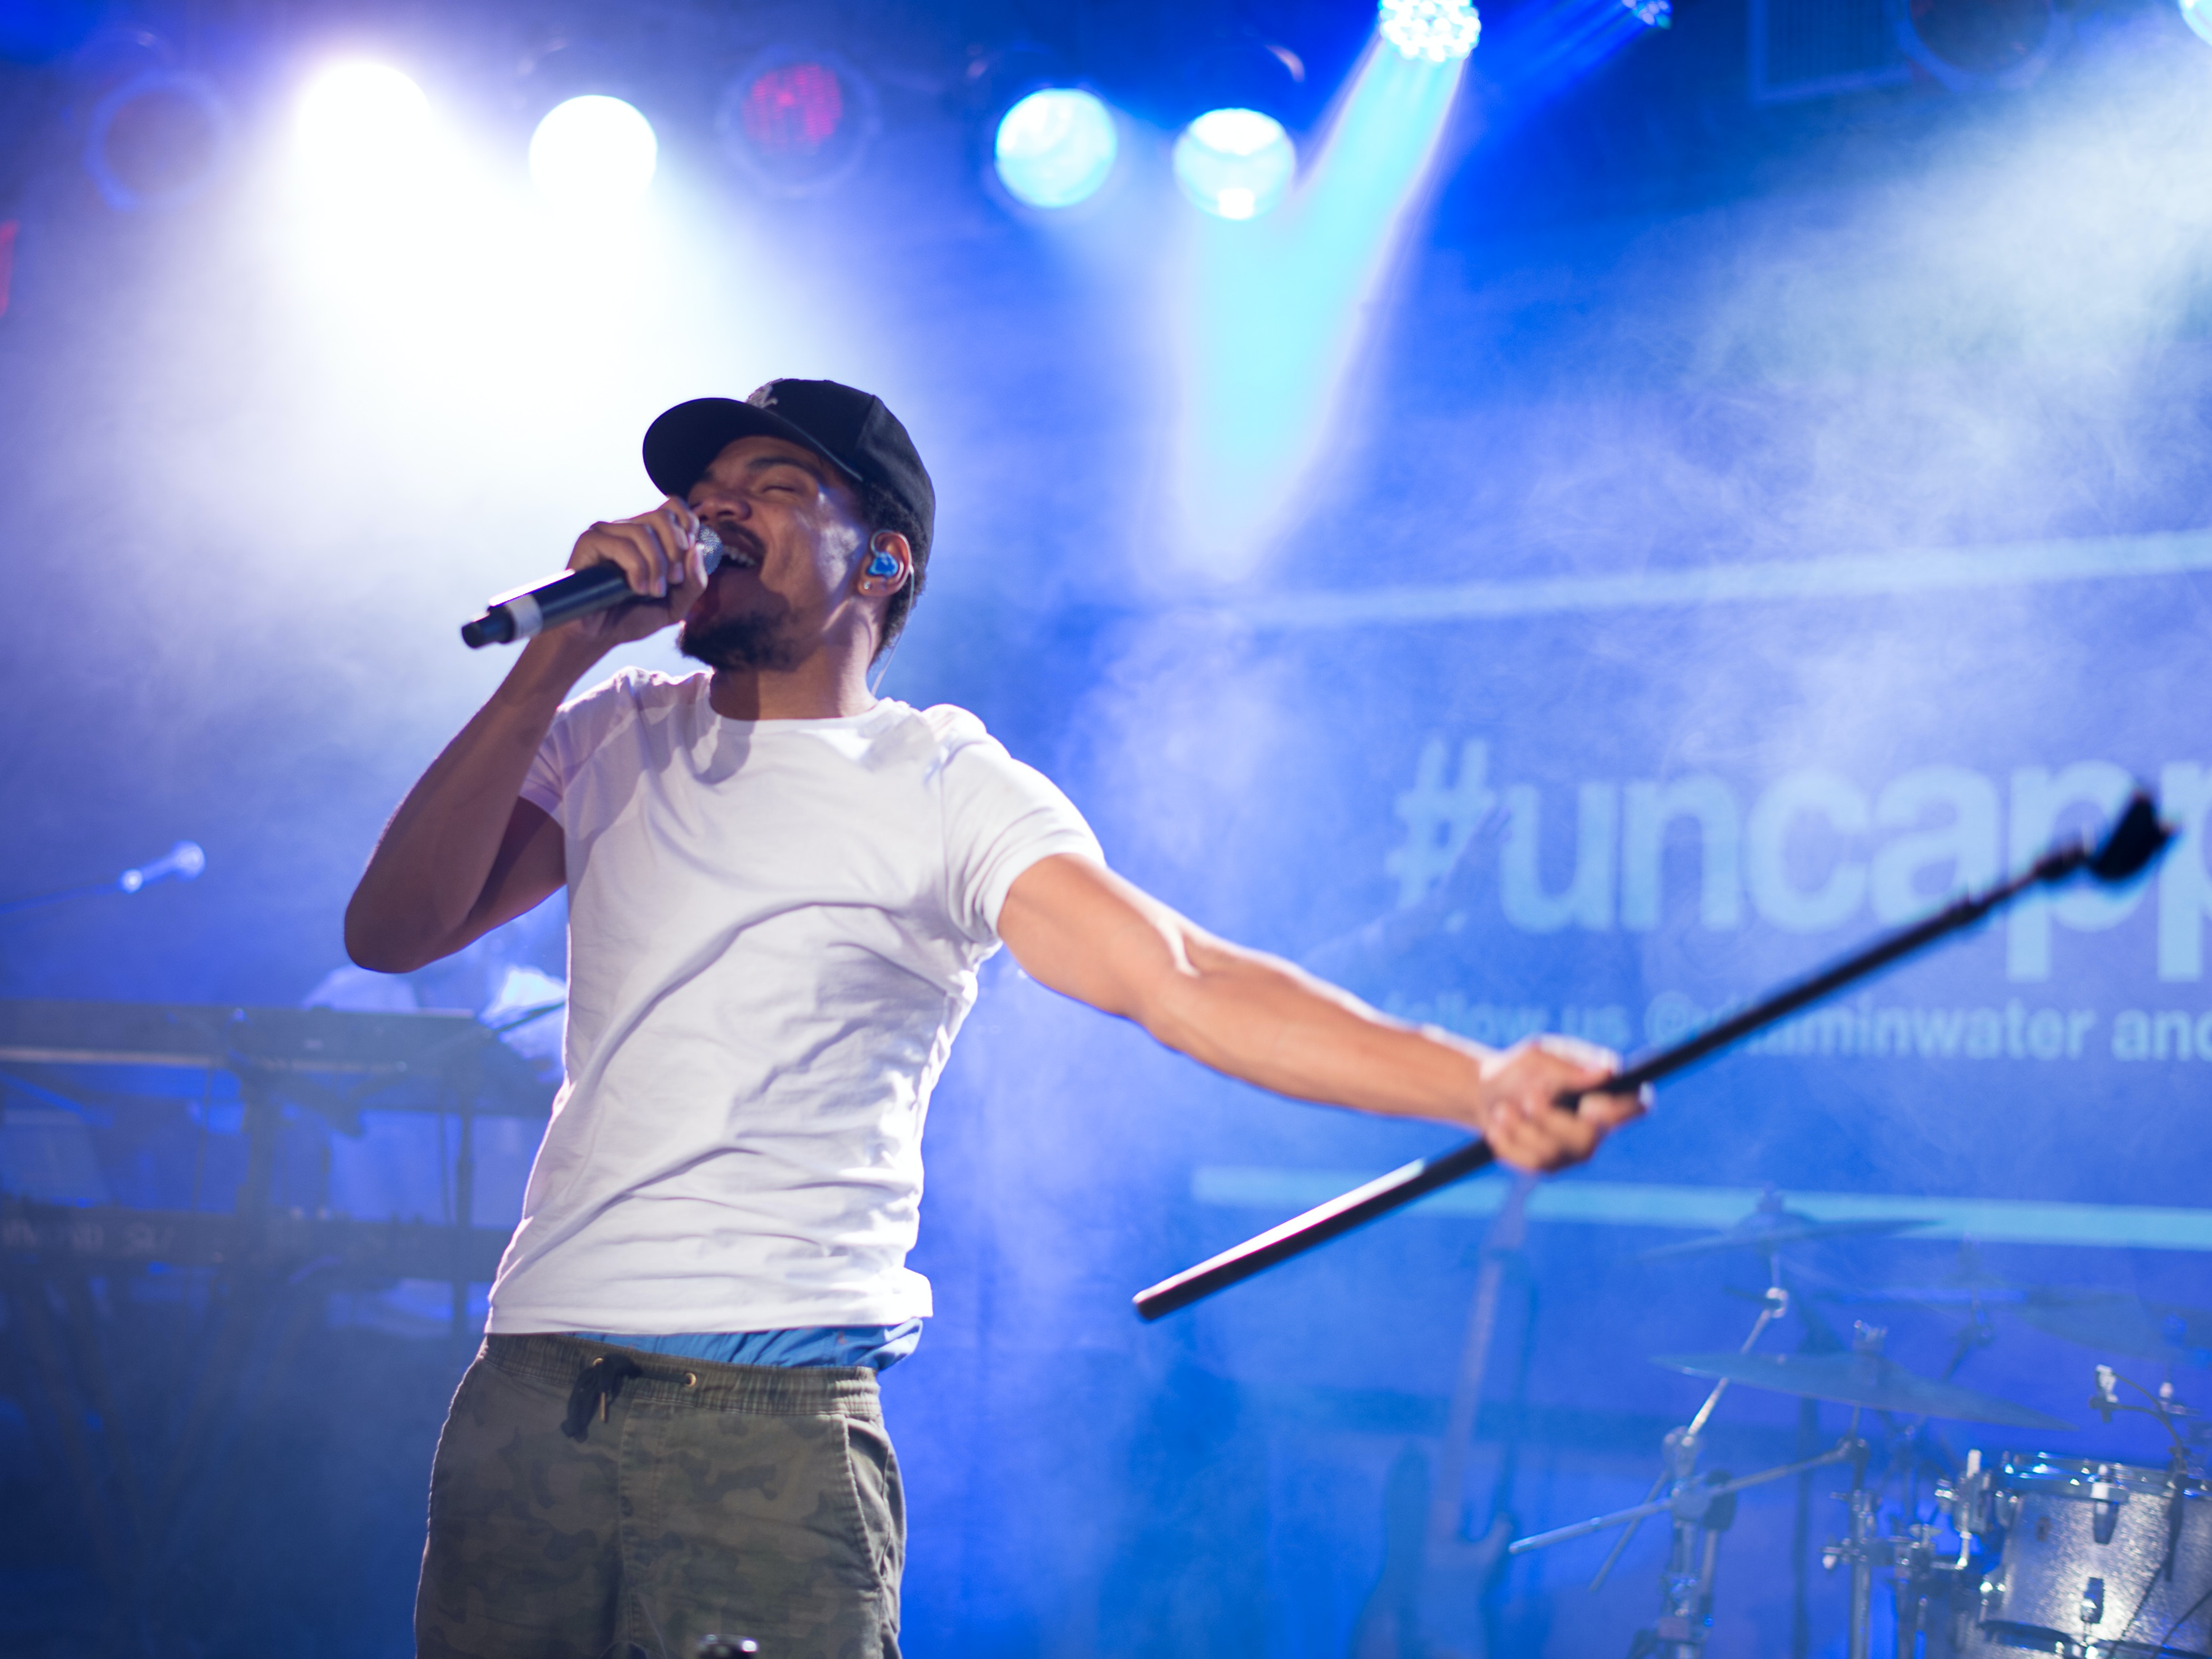 Chance the Rapper, Chance 3, Album, Release Date, Chicago, Rap